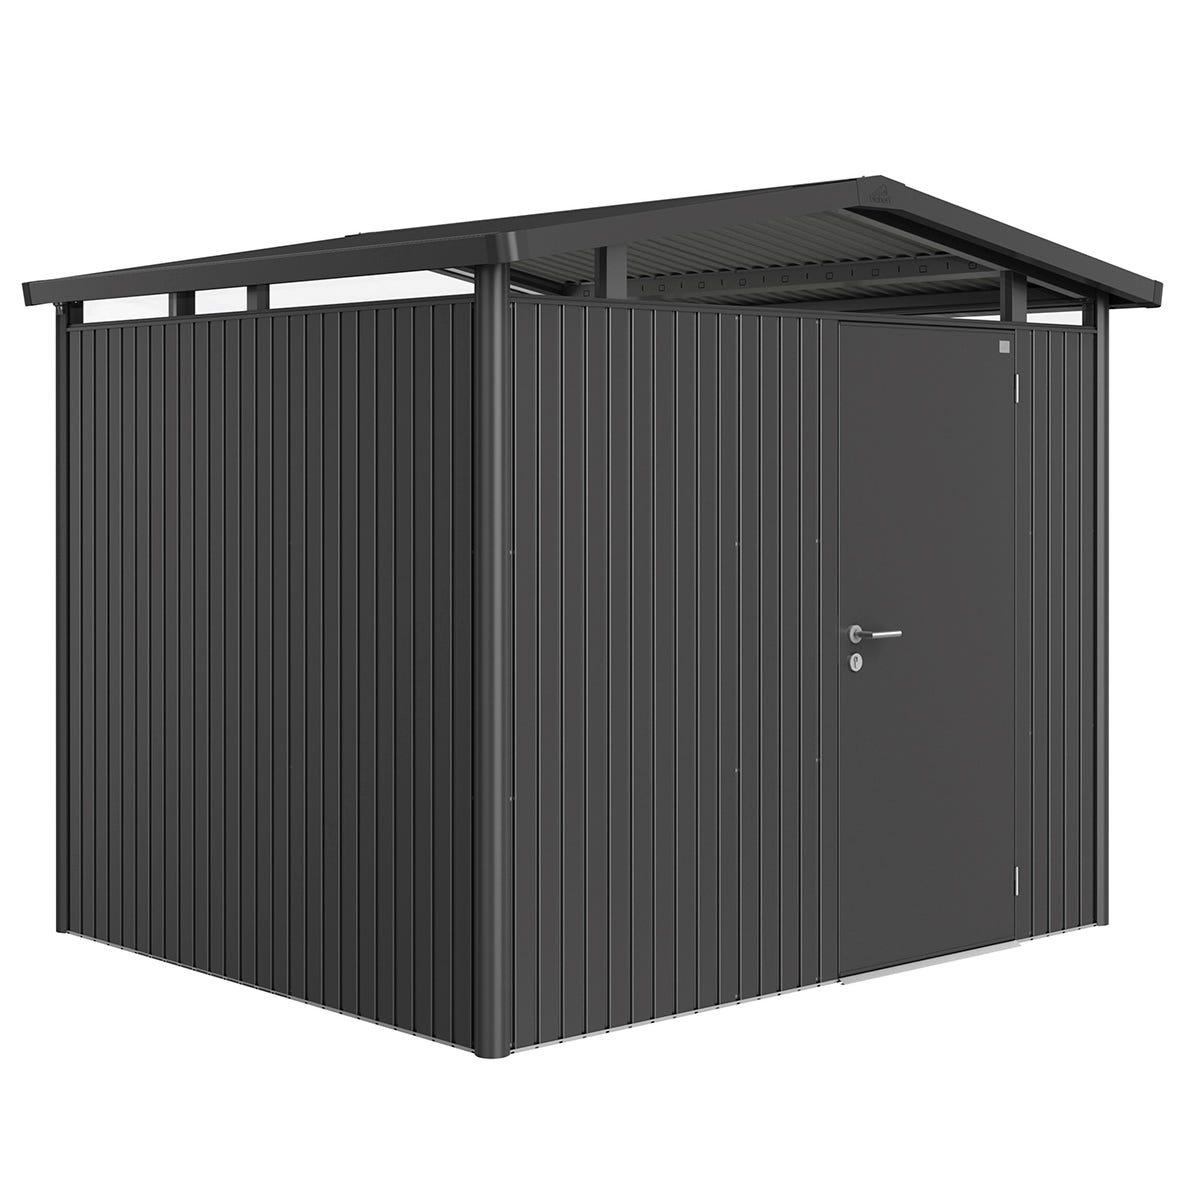 Biohort Panorama Metal Shed P3 Standard Door 9' x 7' 8'' - Dark Grey